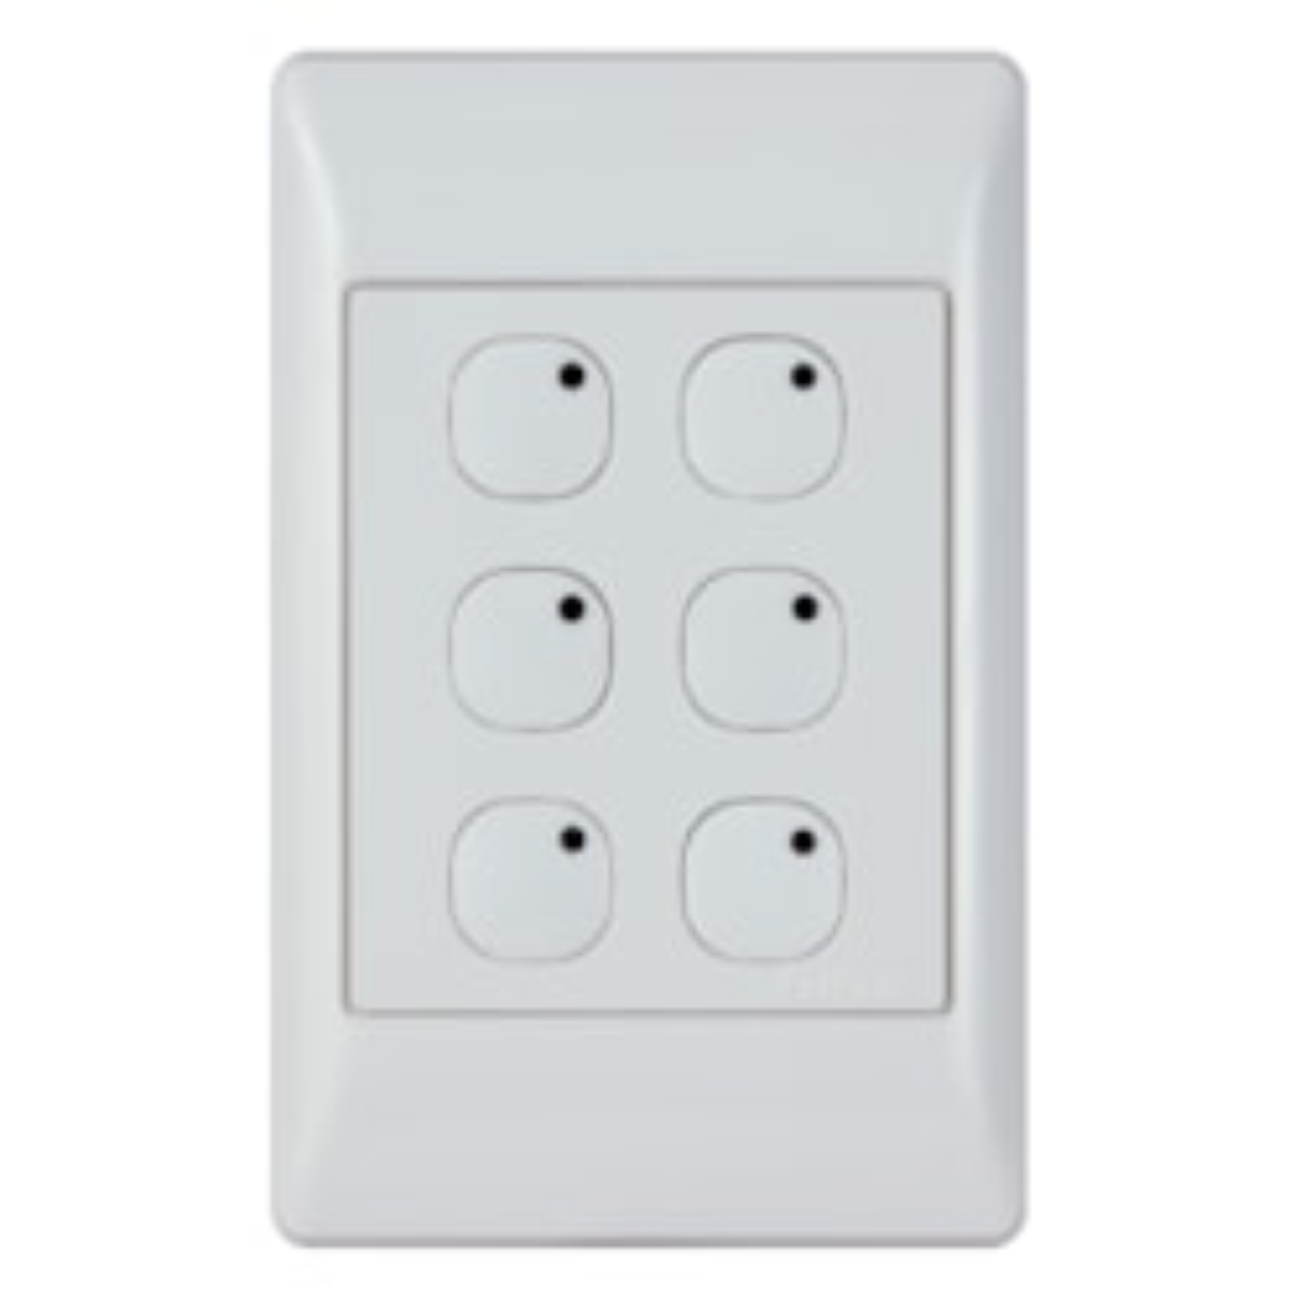 HAI 113A00-8 Hard Wire Switch